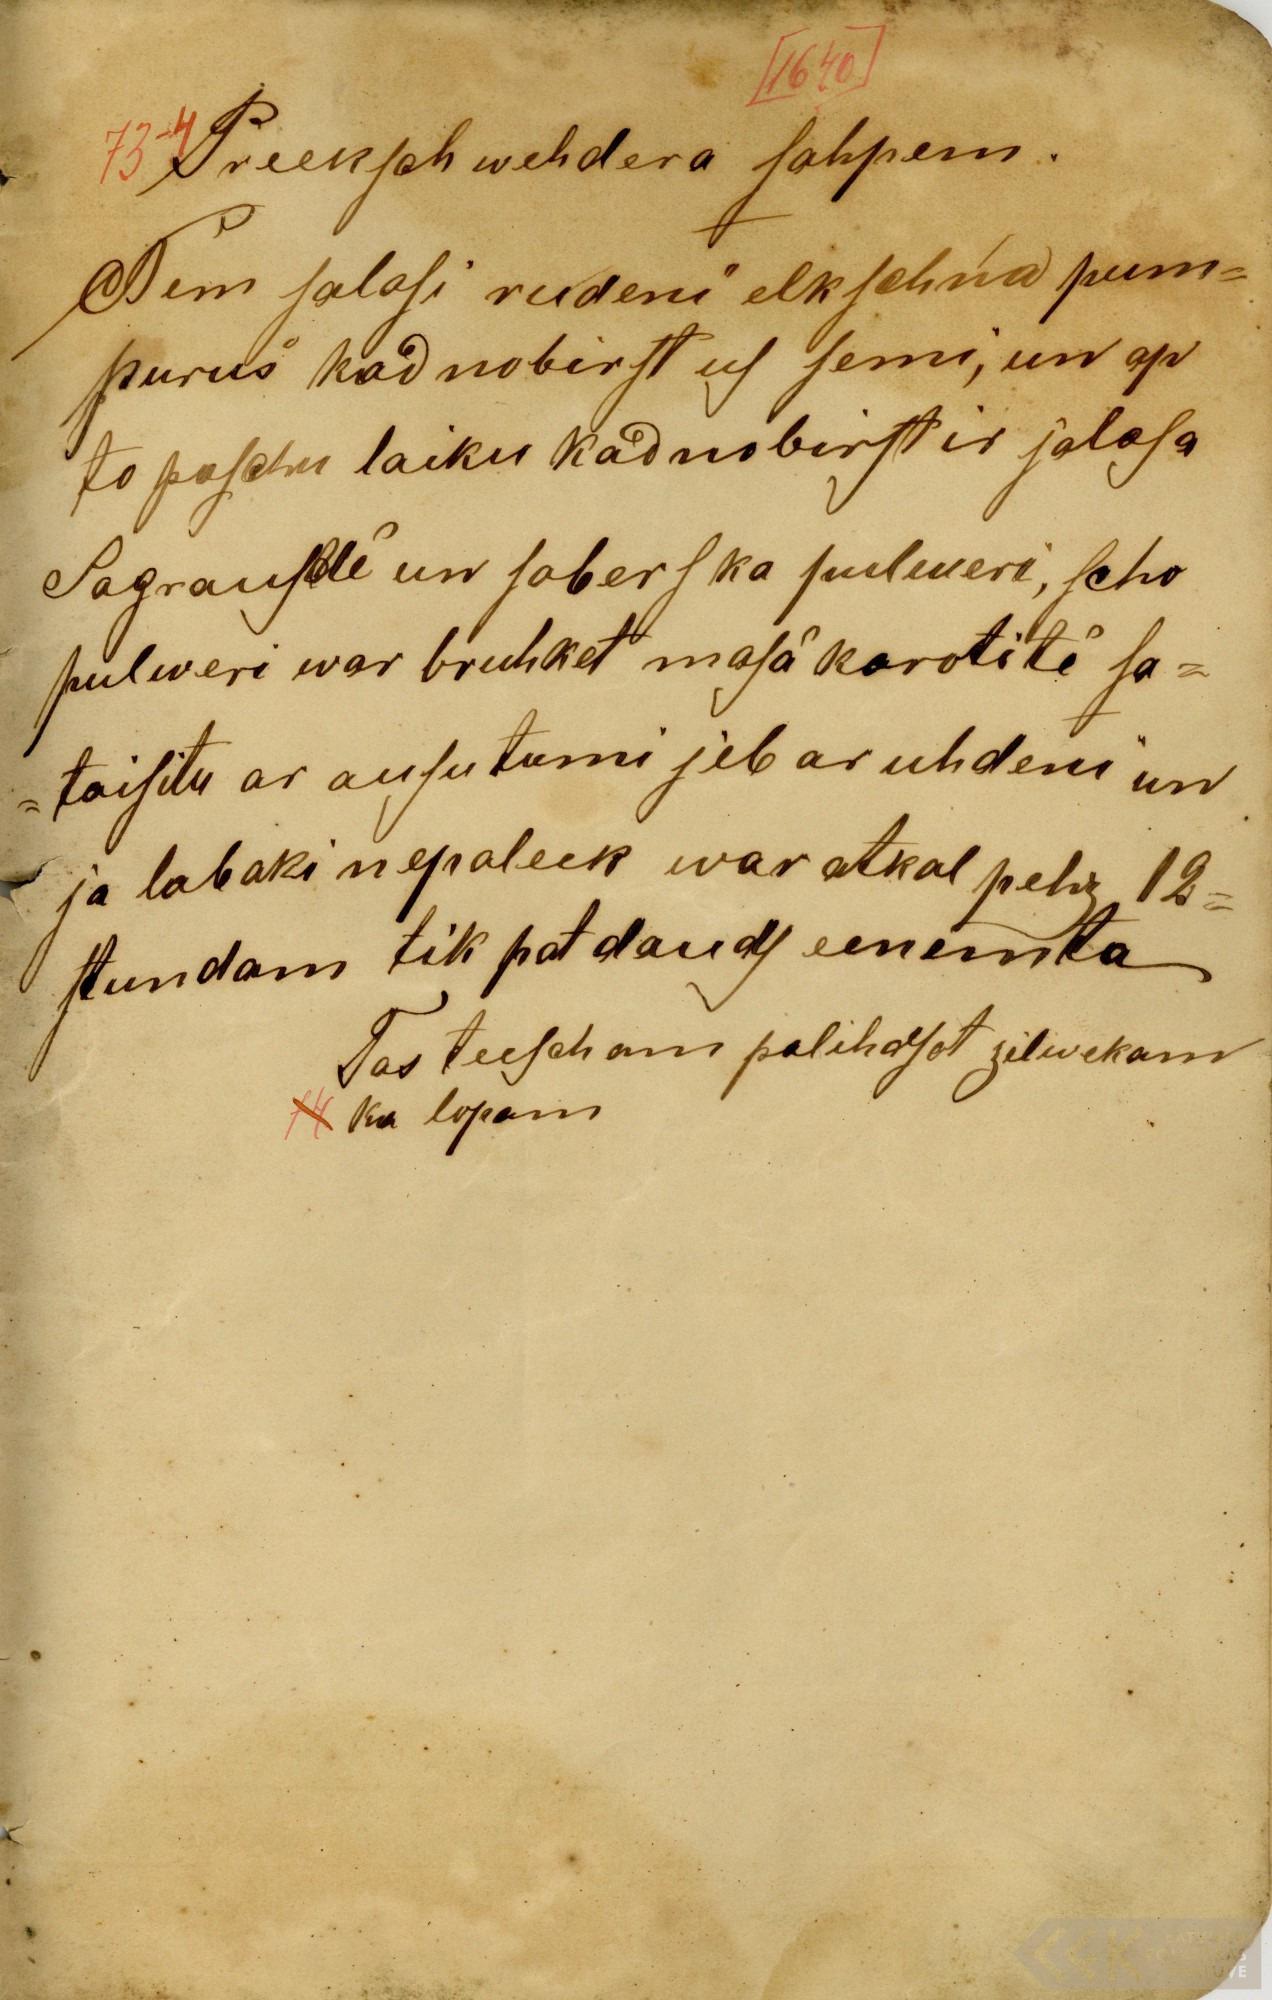 1640-Janis-Alberts-Jansons-01-0033